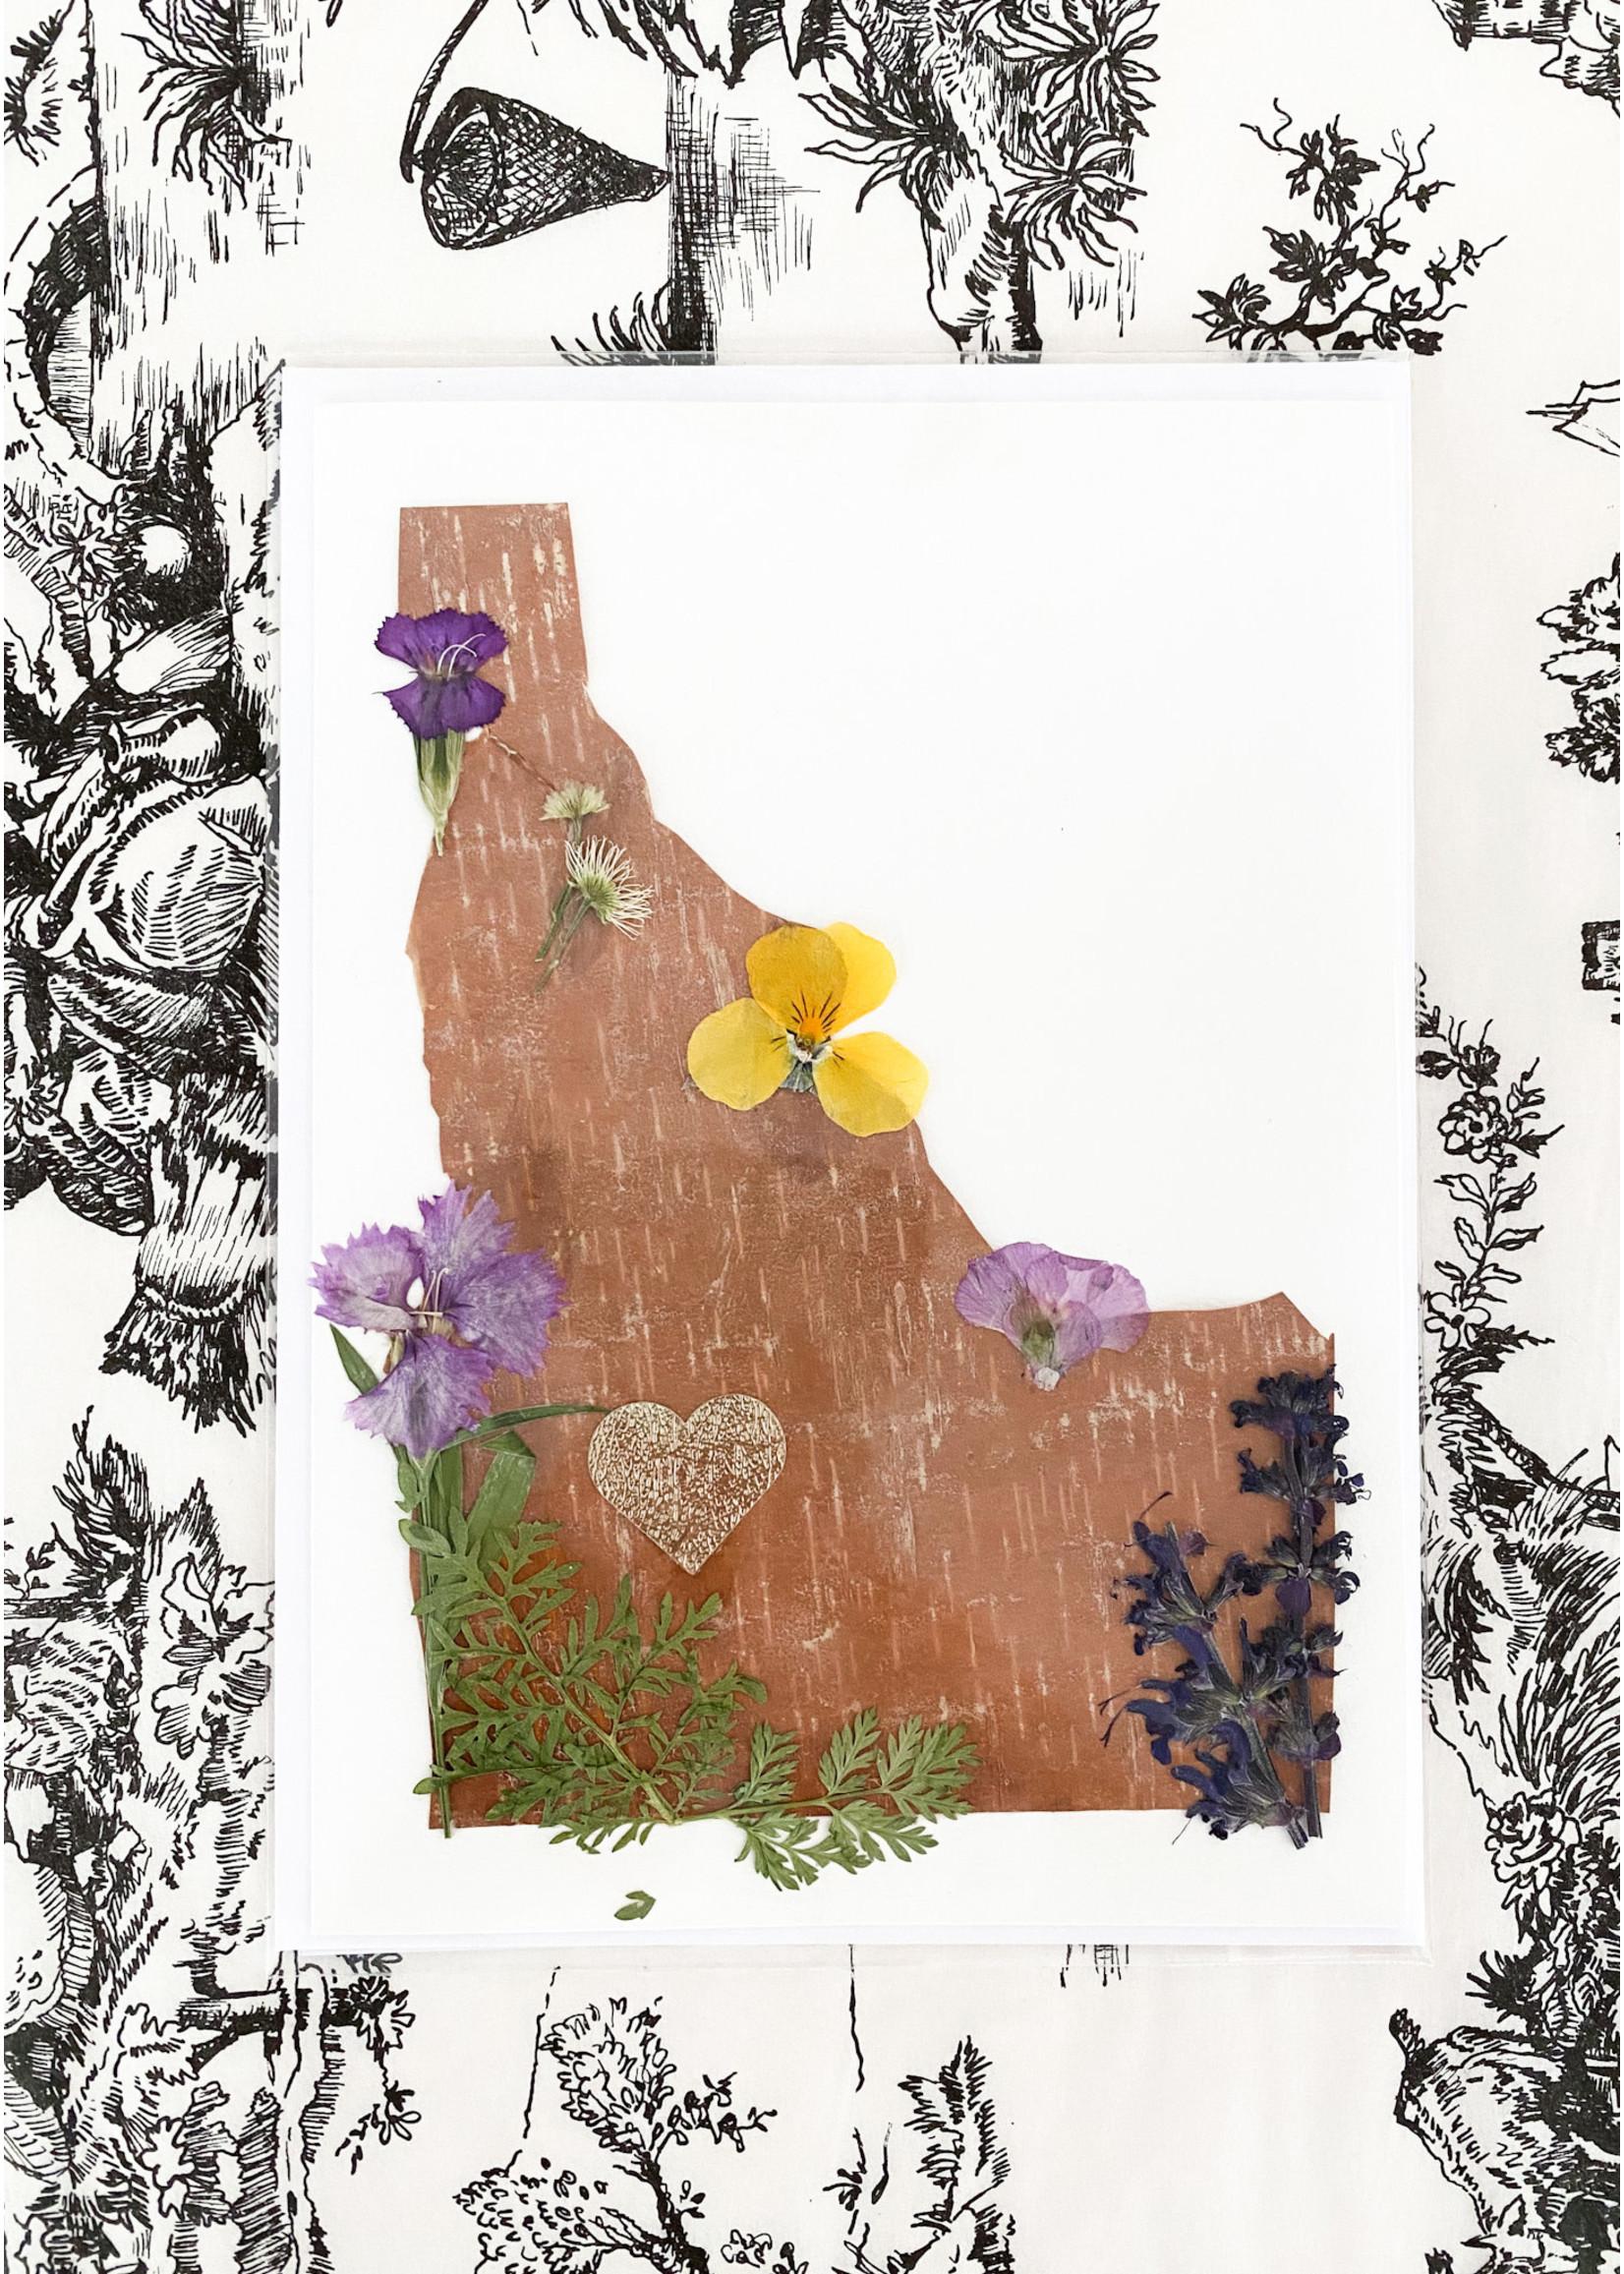 Warm Springs Studio Locally Handmade & Pressed Flower & Birch Cards